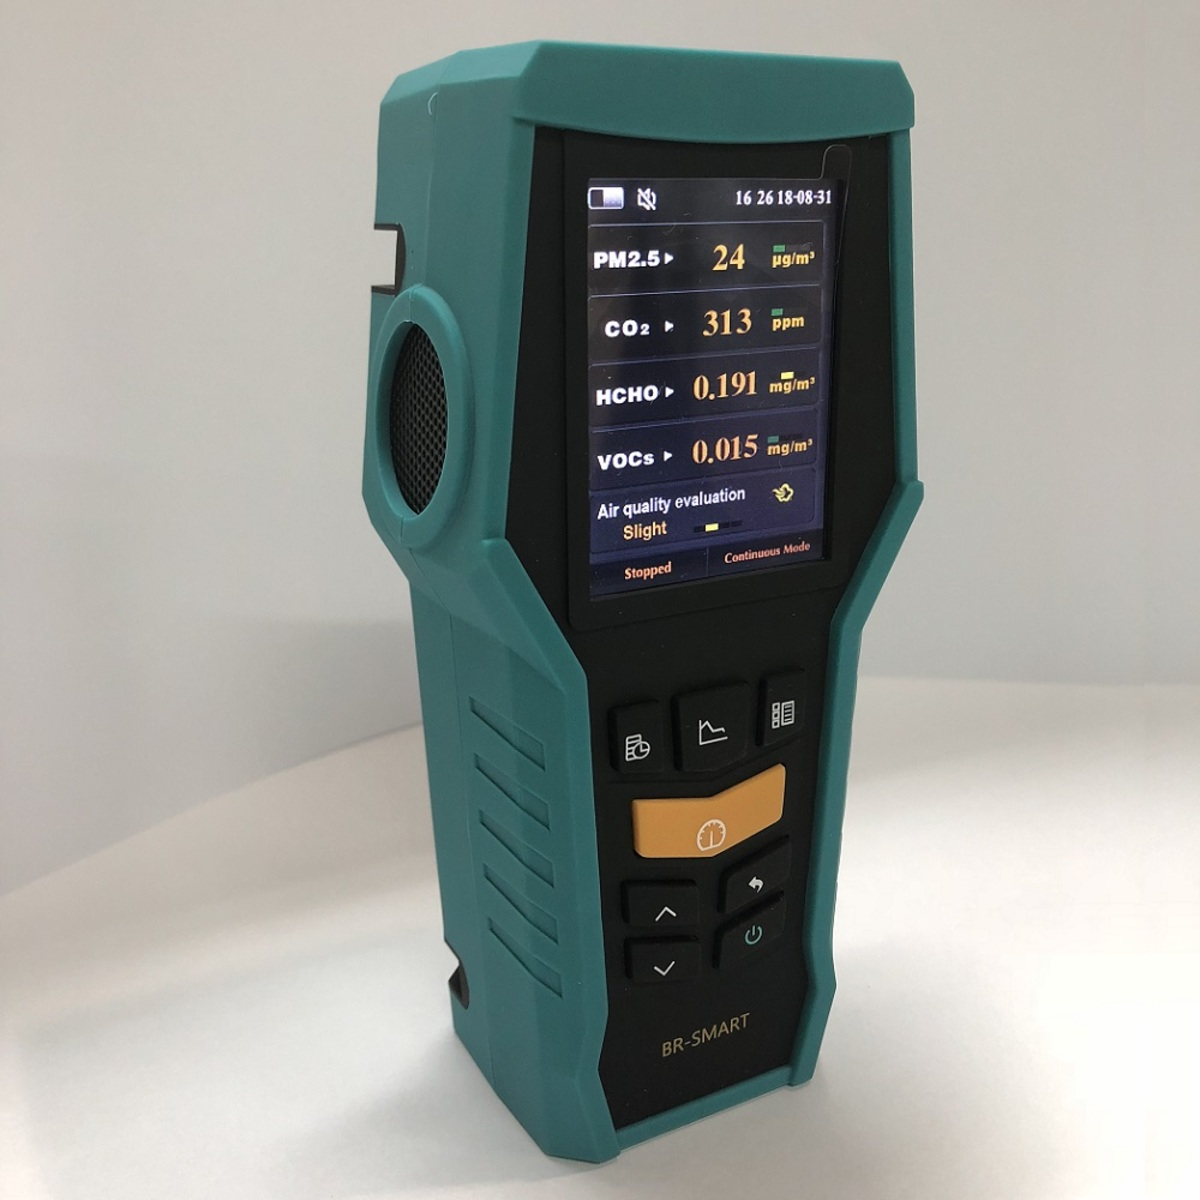 BRAMC   Smart 128 Formaldehyde Monitor Portable TVOC Dust